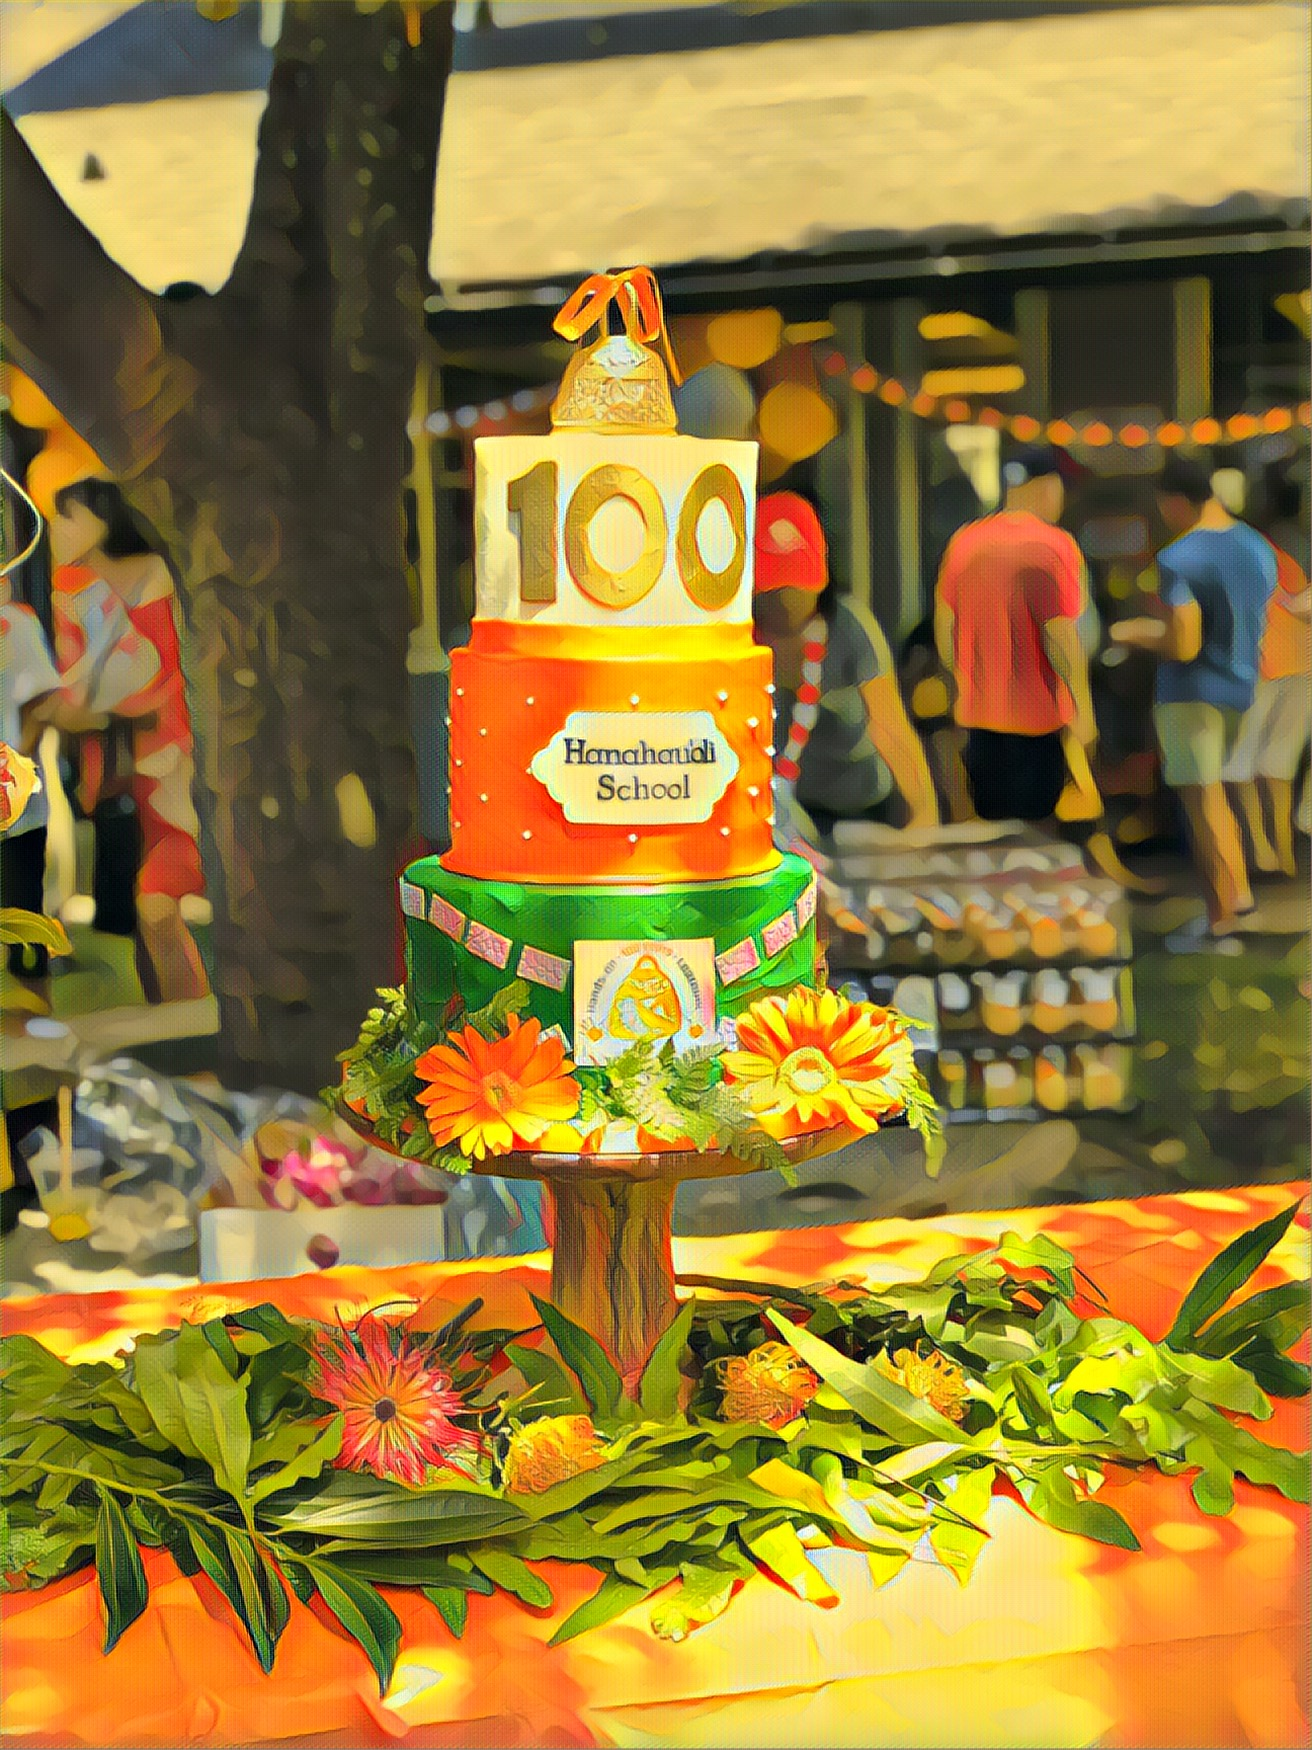 100th Bday Cake.JPG